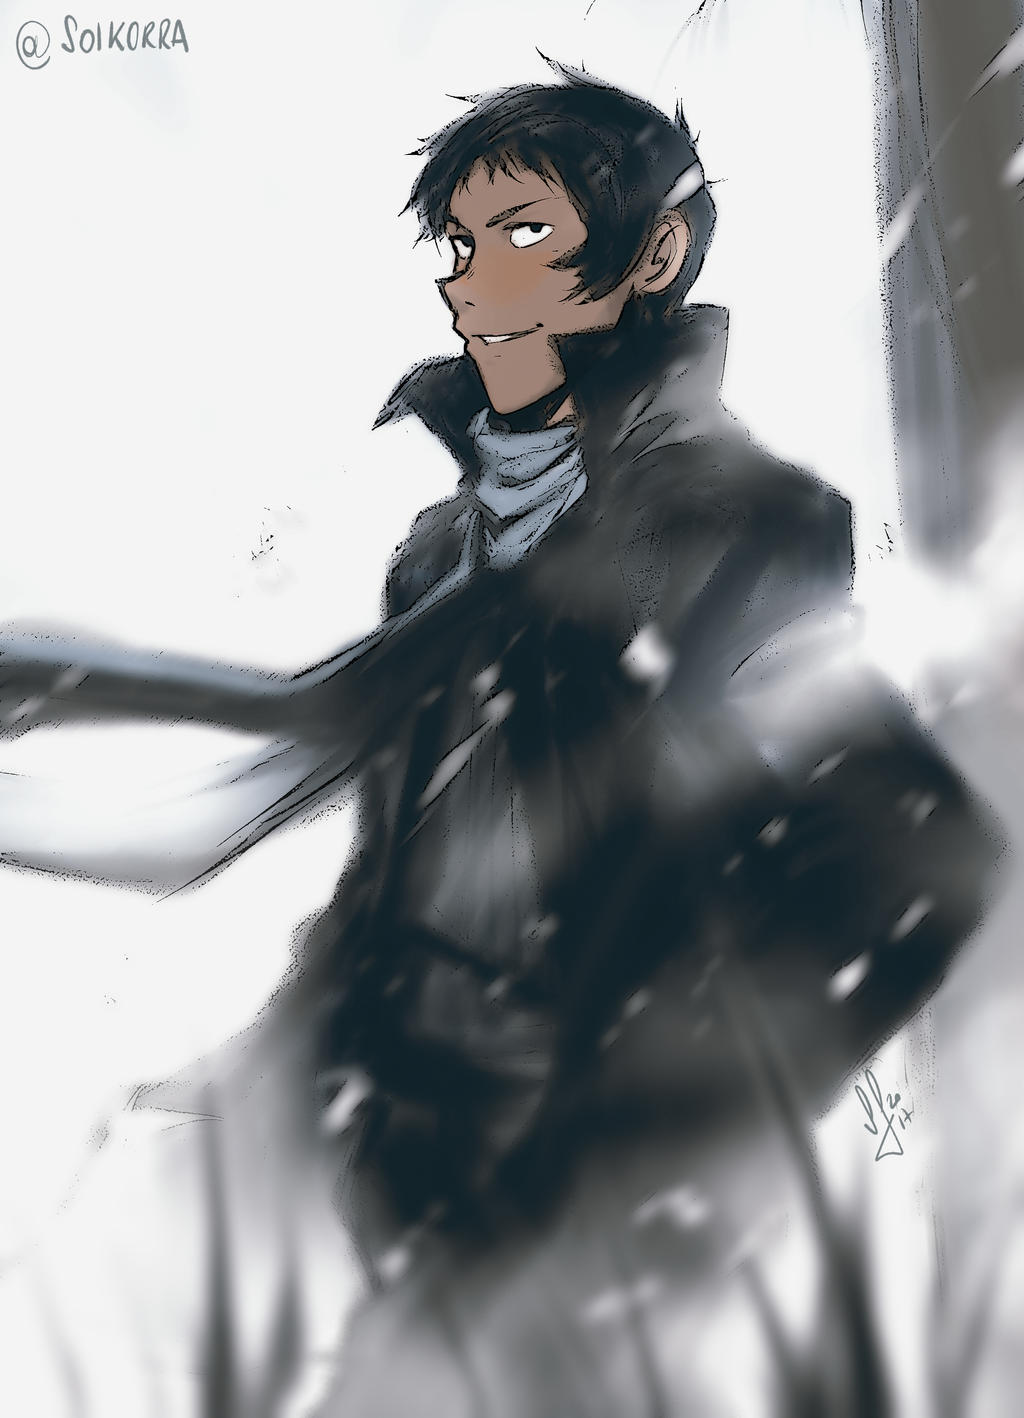 Lance in snow